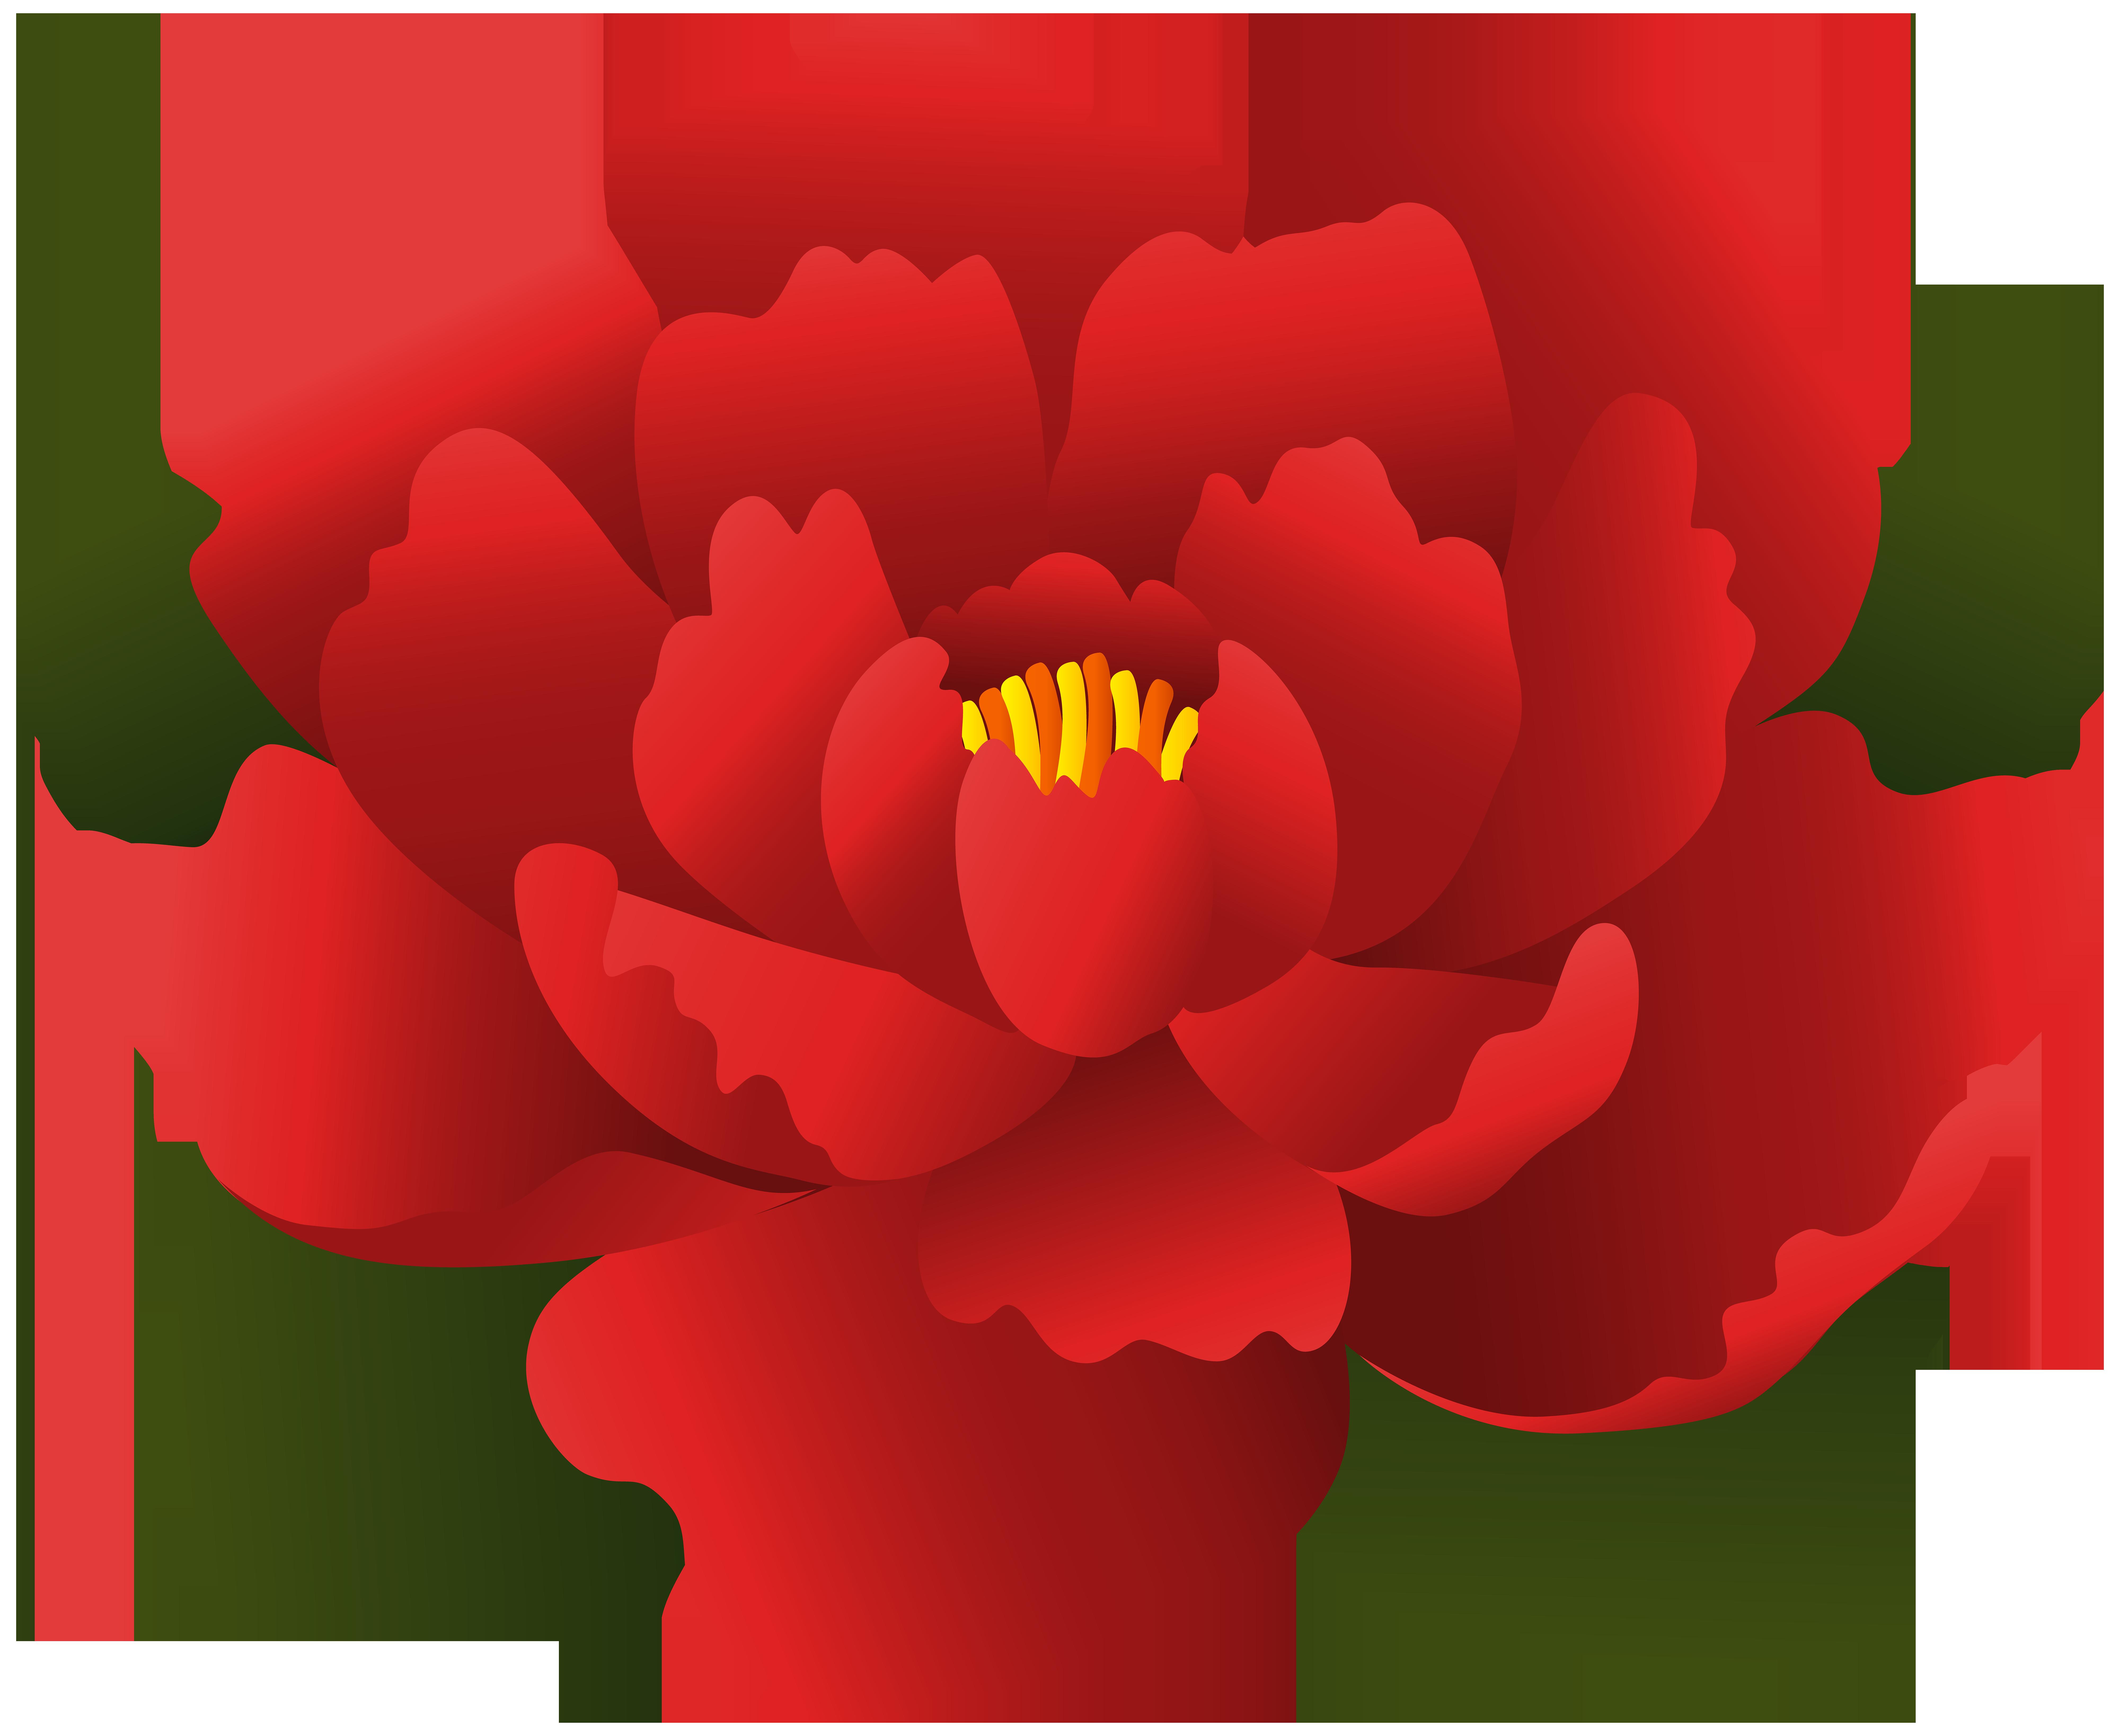 8000x6552 Red Flower Transparent Clip Artu200b Gallery Yopriceville